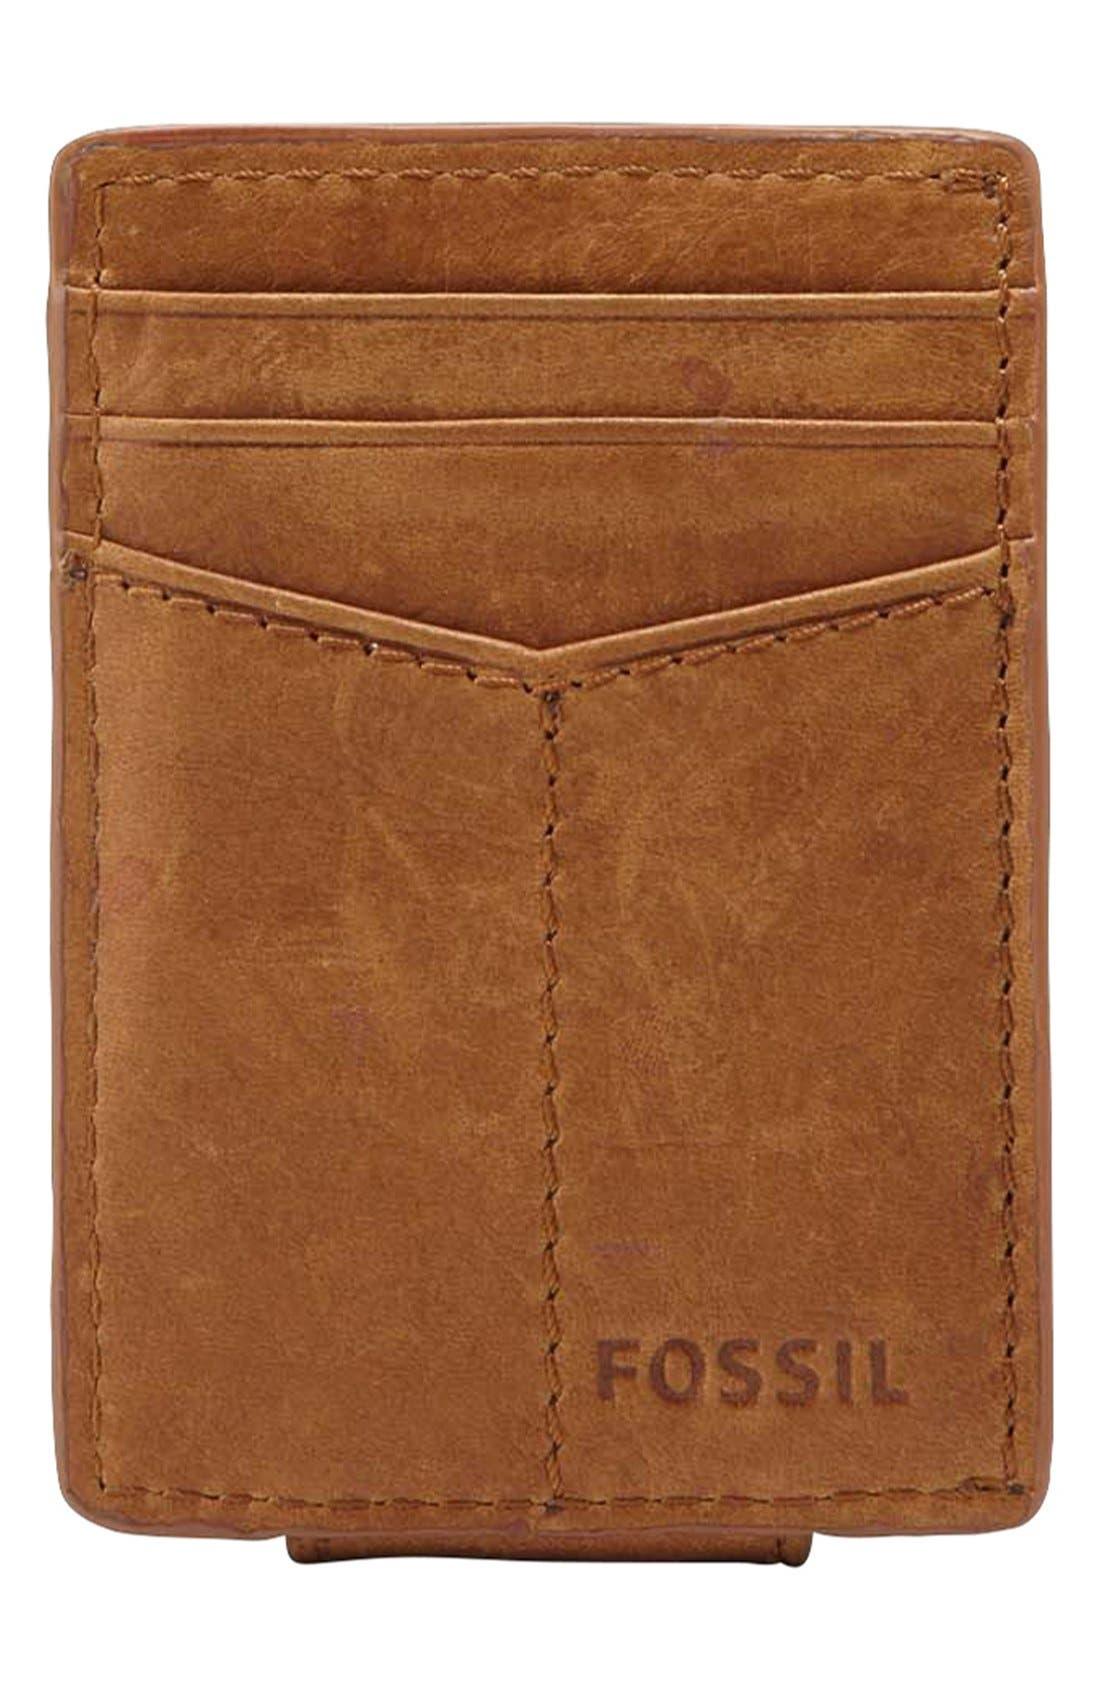 Alternate Image 2  - Fossil 'Ingram' Leather Magnetic Money Clip Card Case